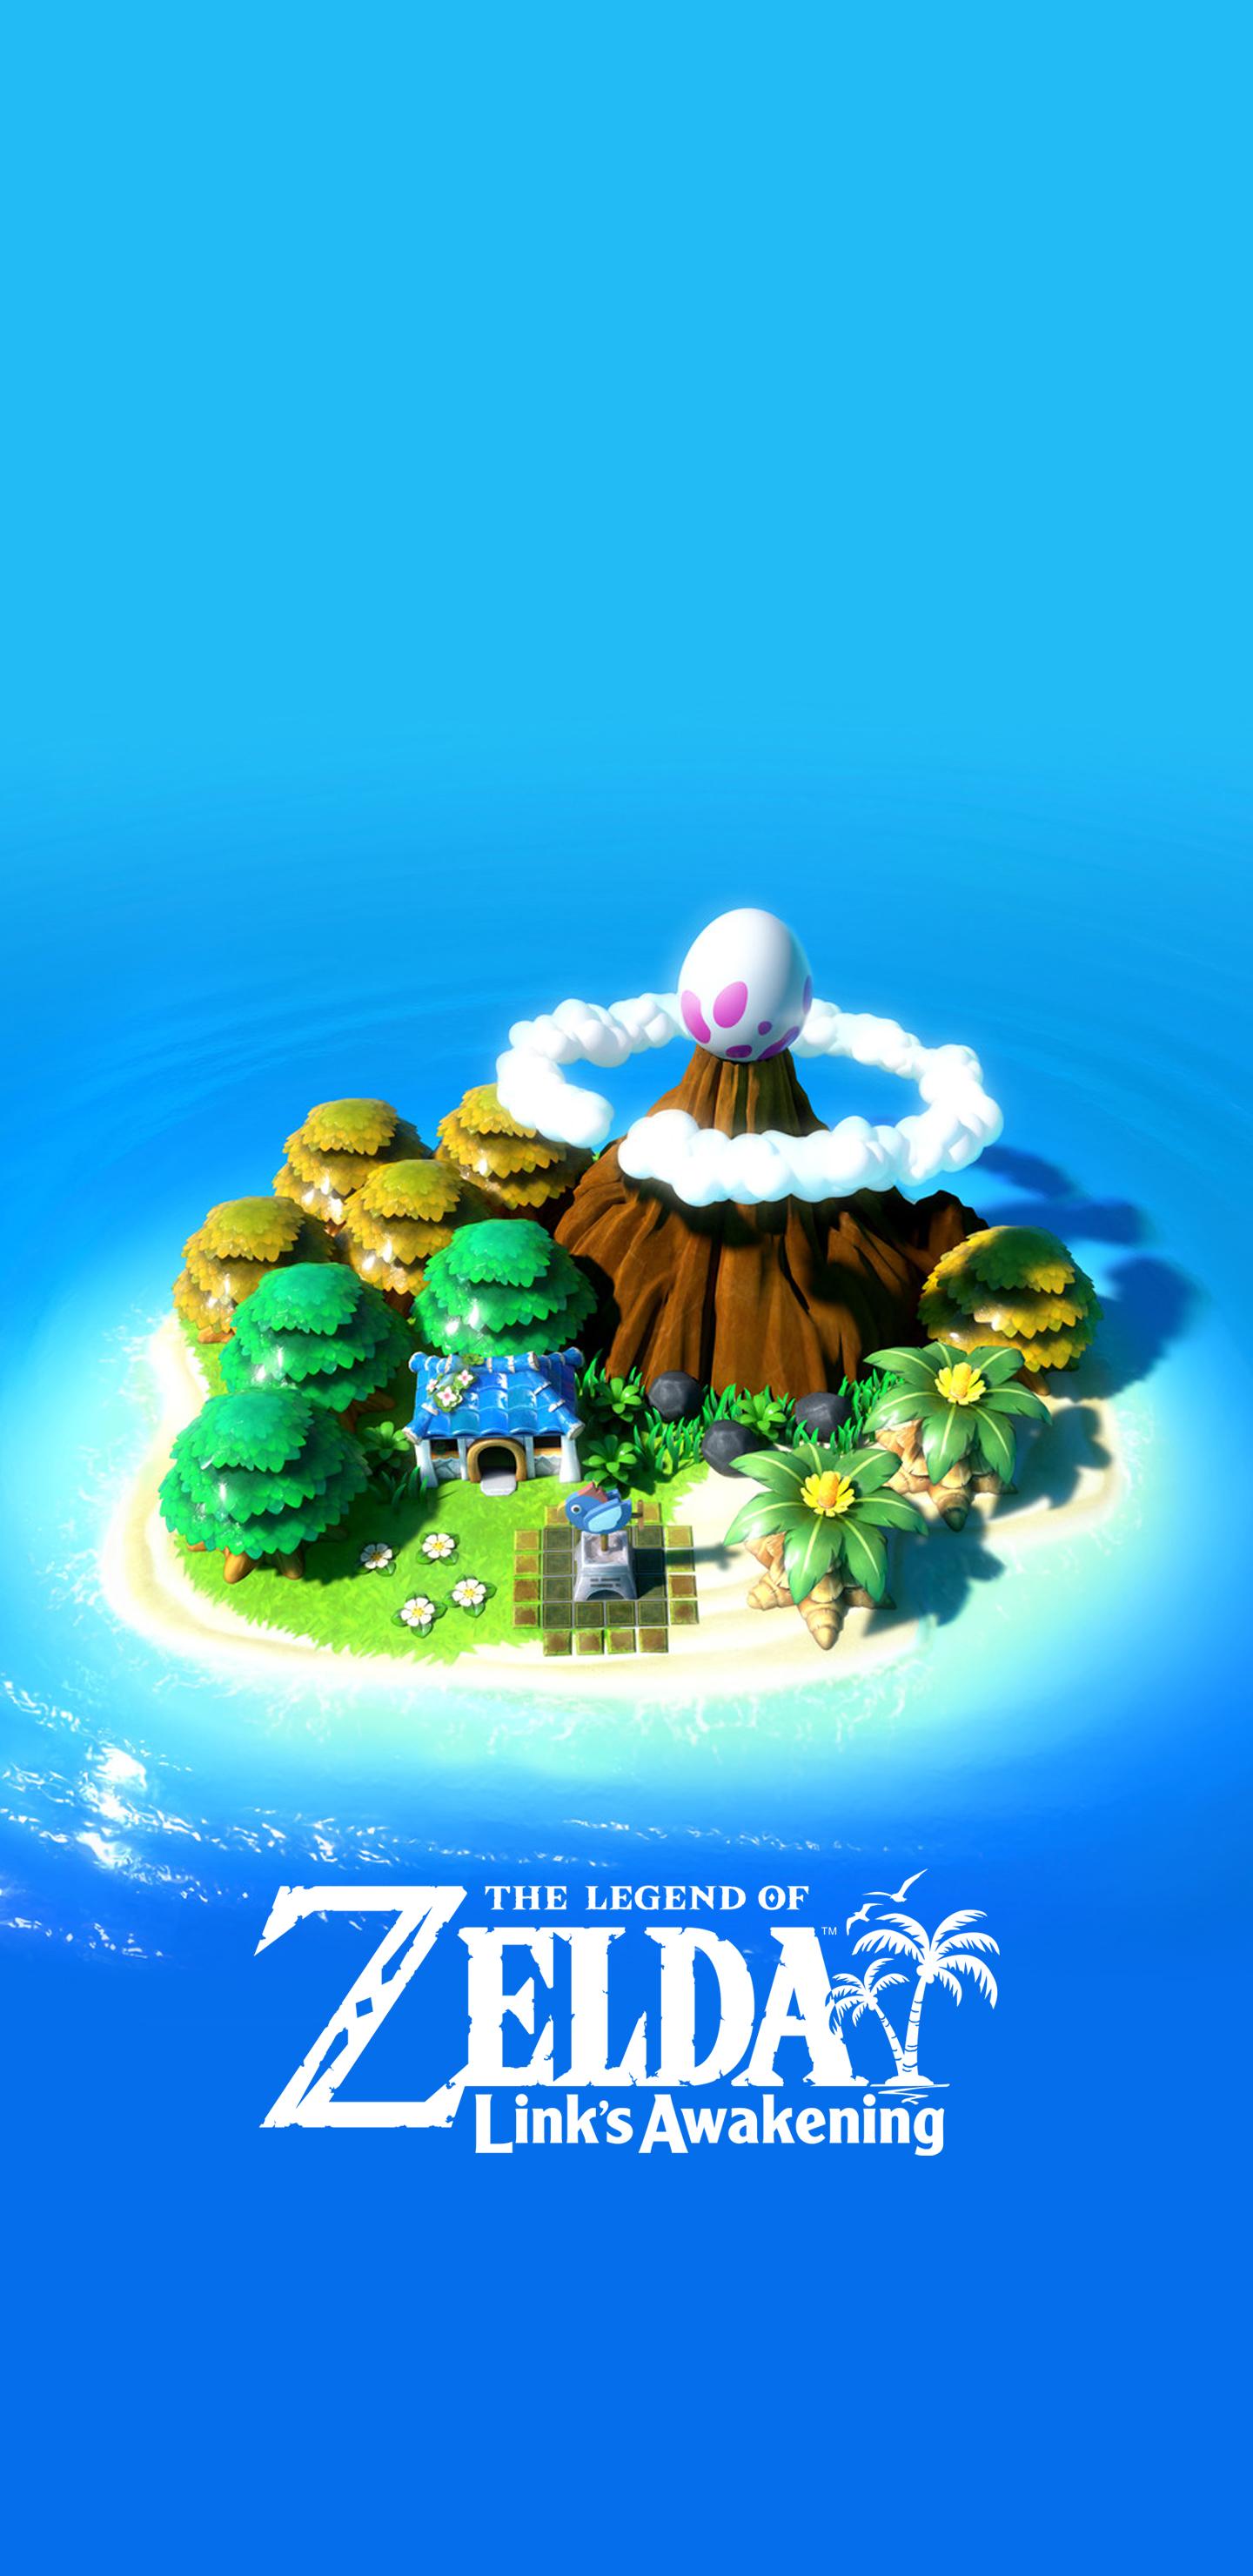 The Legend Of Zelda Link S Awakening Koholint Island Wallpaper Cat With Monocle